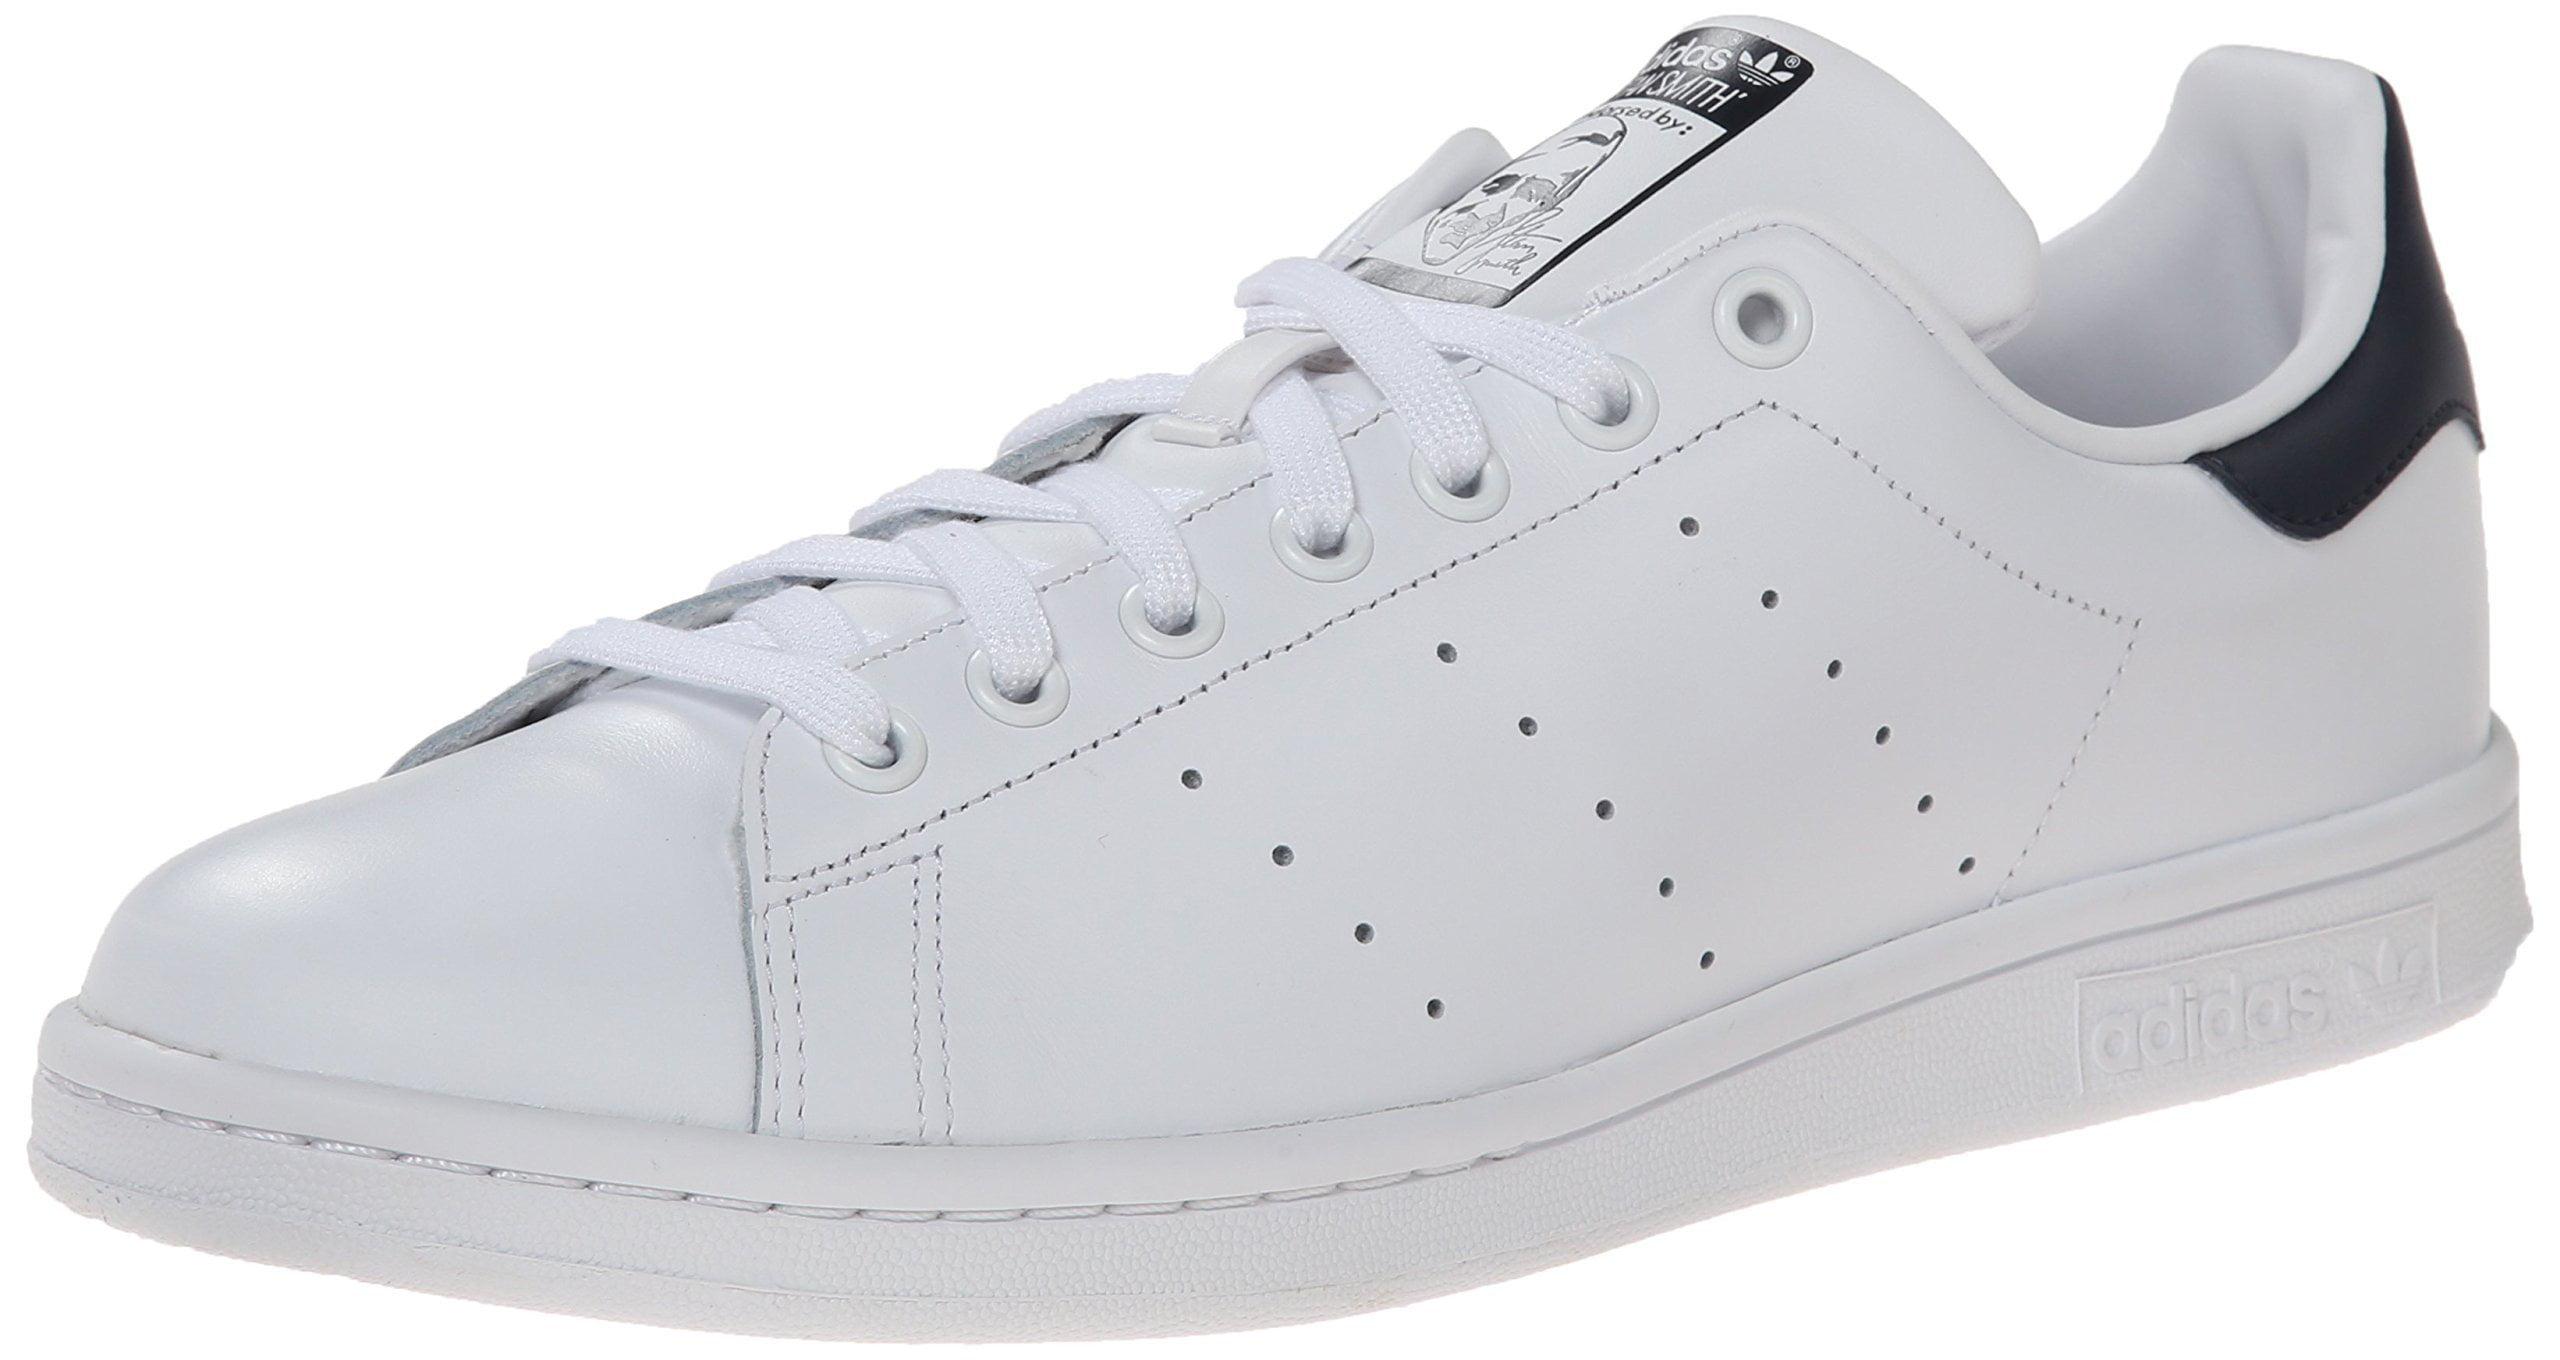 adidas originaux blanc camo nmd r1 formateurs ftwr fabuleux pastel